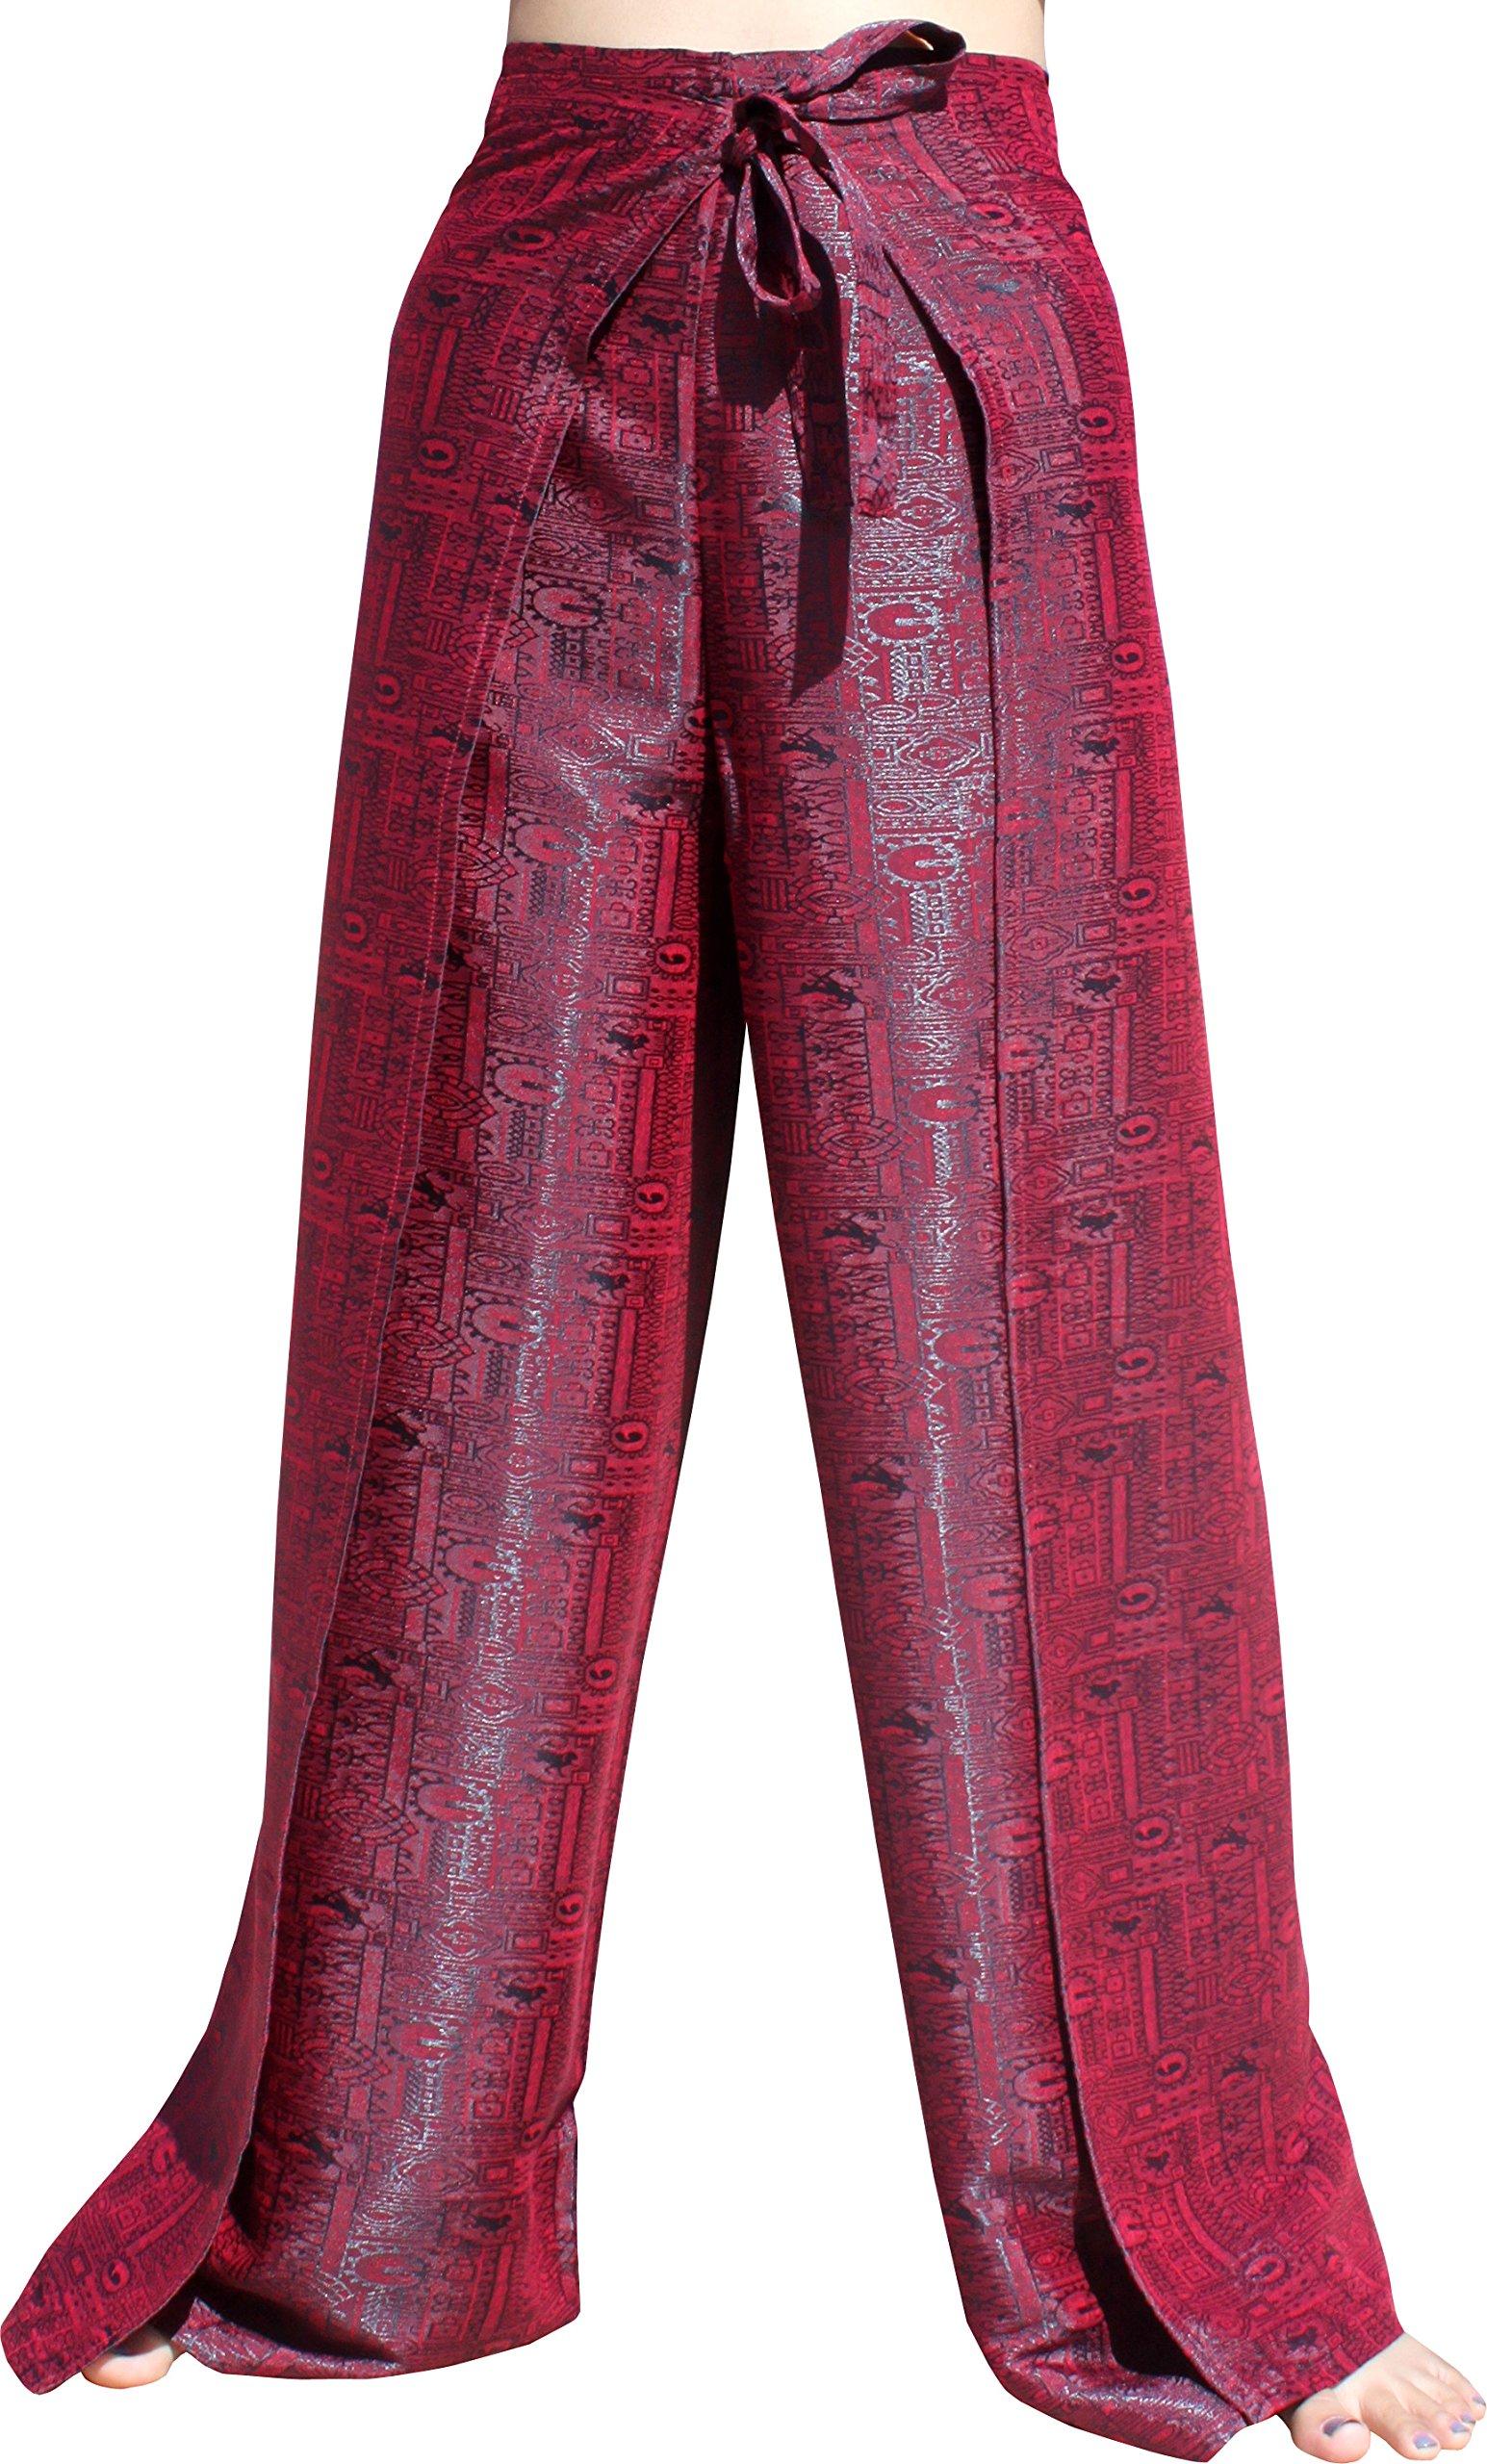 RaanPahMuang Brand Geometric Thick Textured Silk Drive In Wrap Pants, Medium, Bitter Red by RaanPahMuang